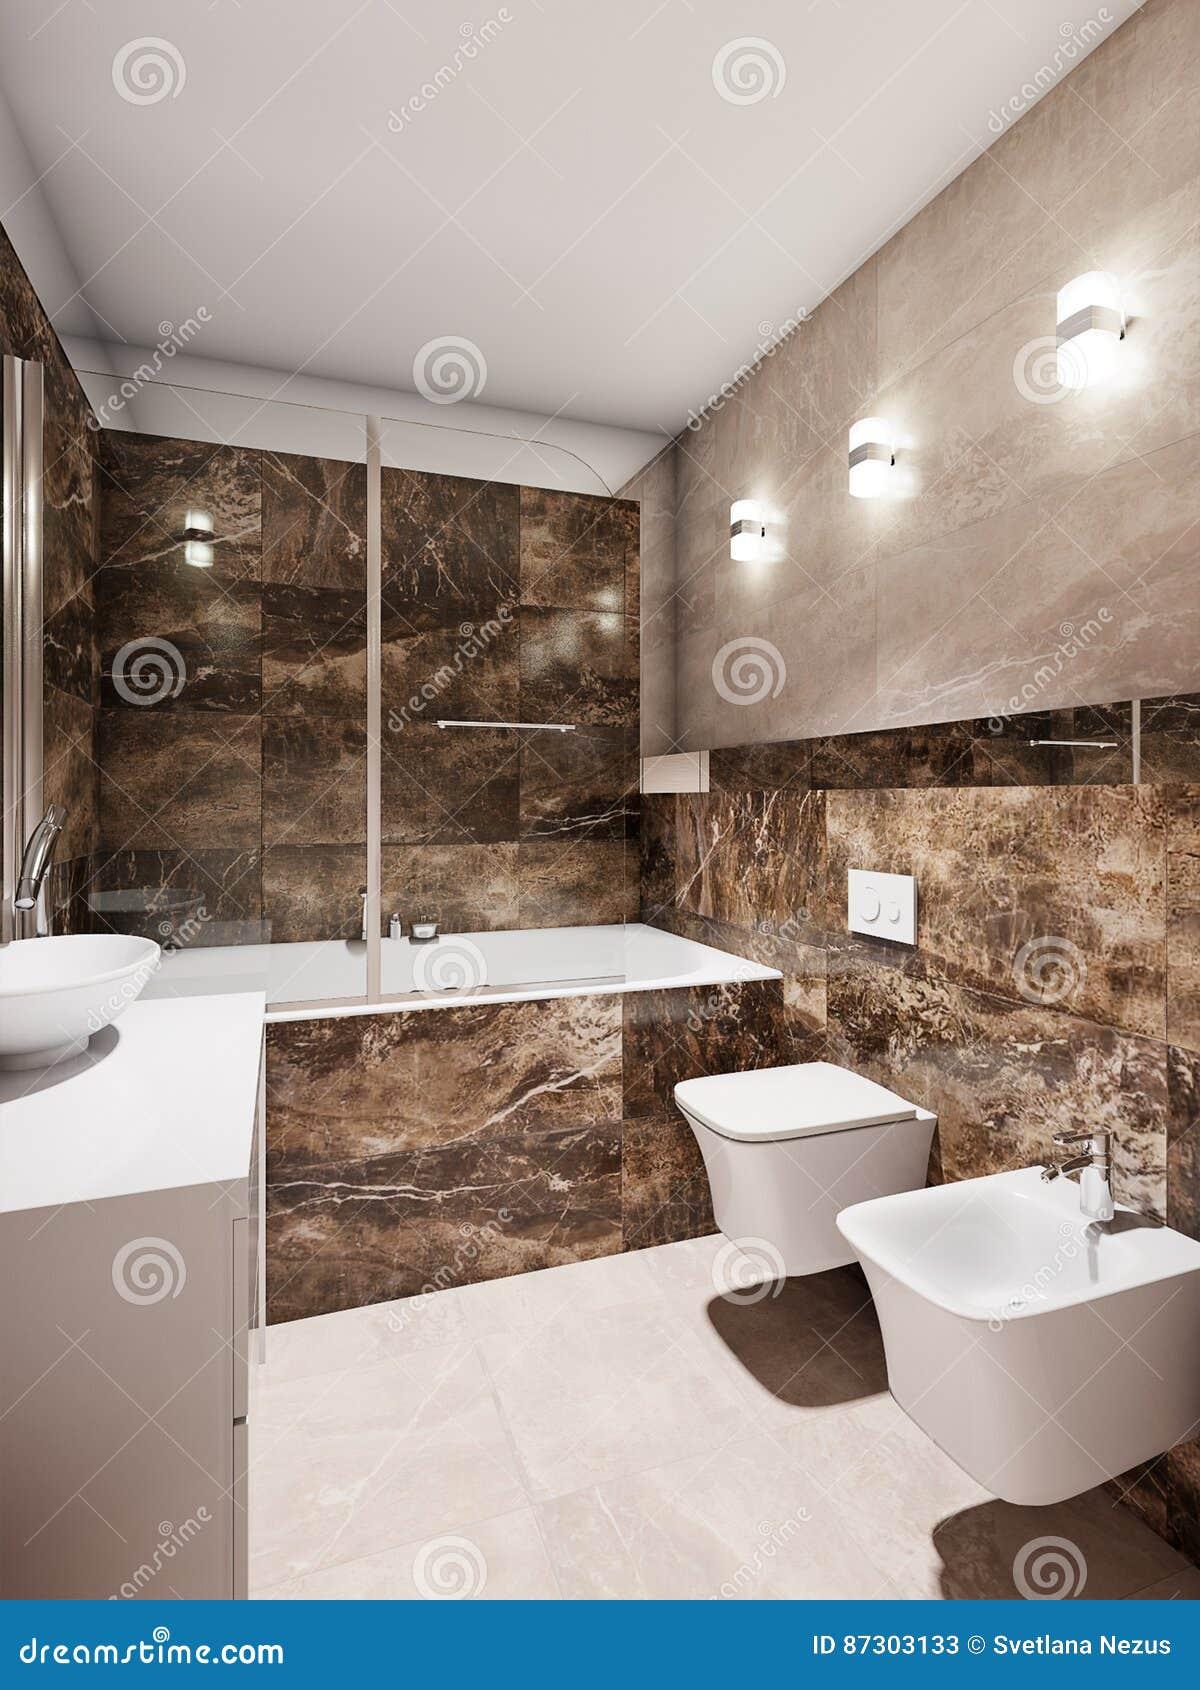 Piastrelle bagno moderne bagno arredo moderno with piastrelle bagno moderne piastrelle marazzi - Piastrelle bagno beige ...